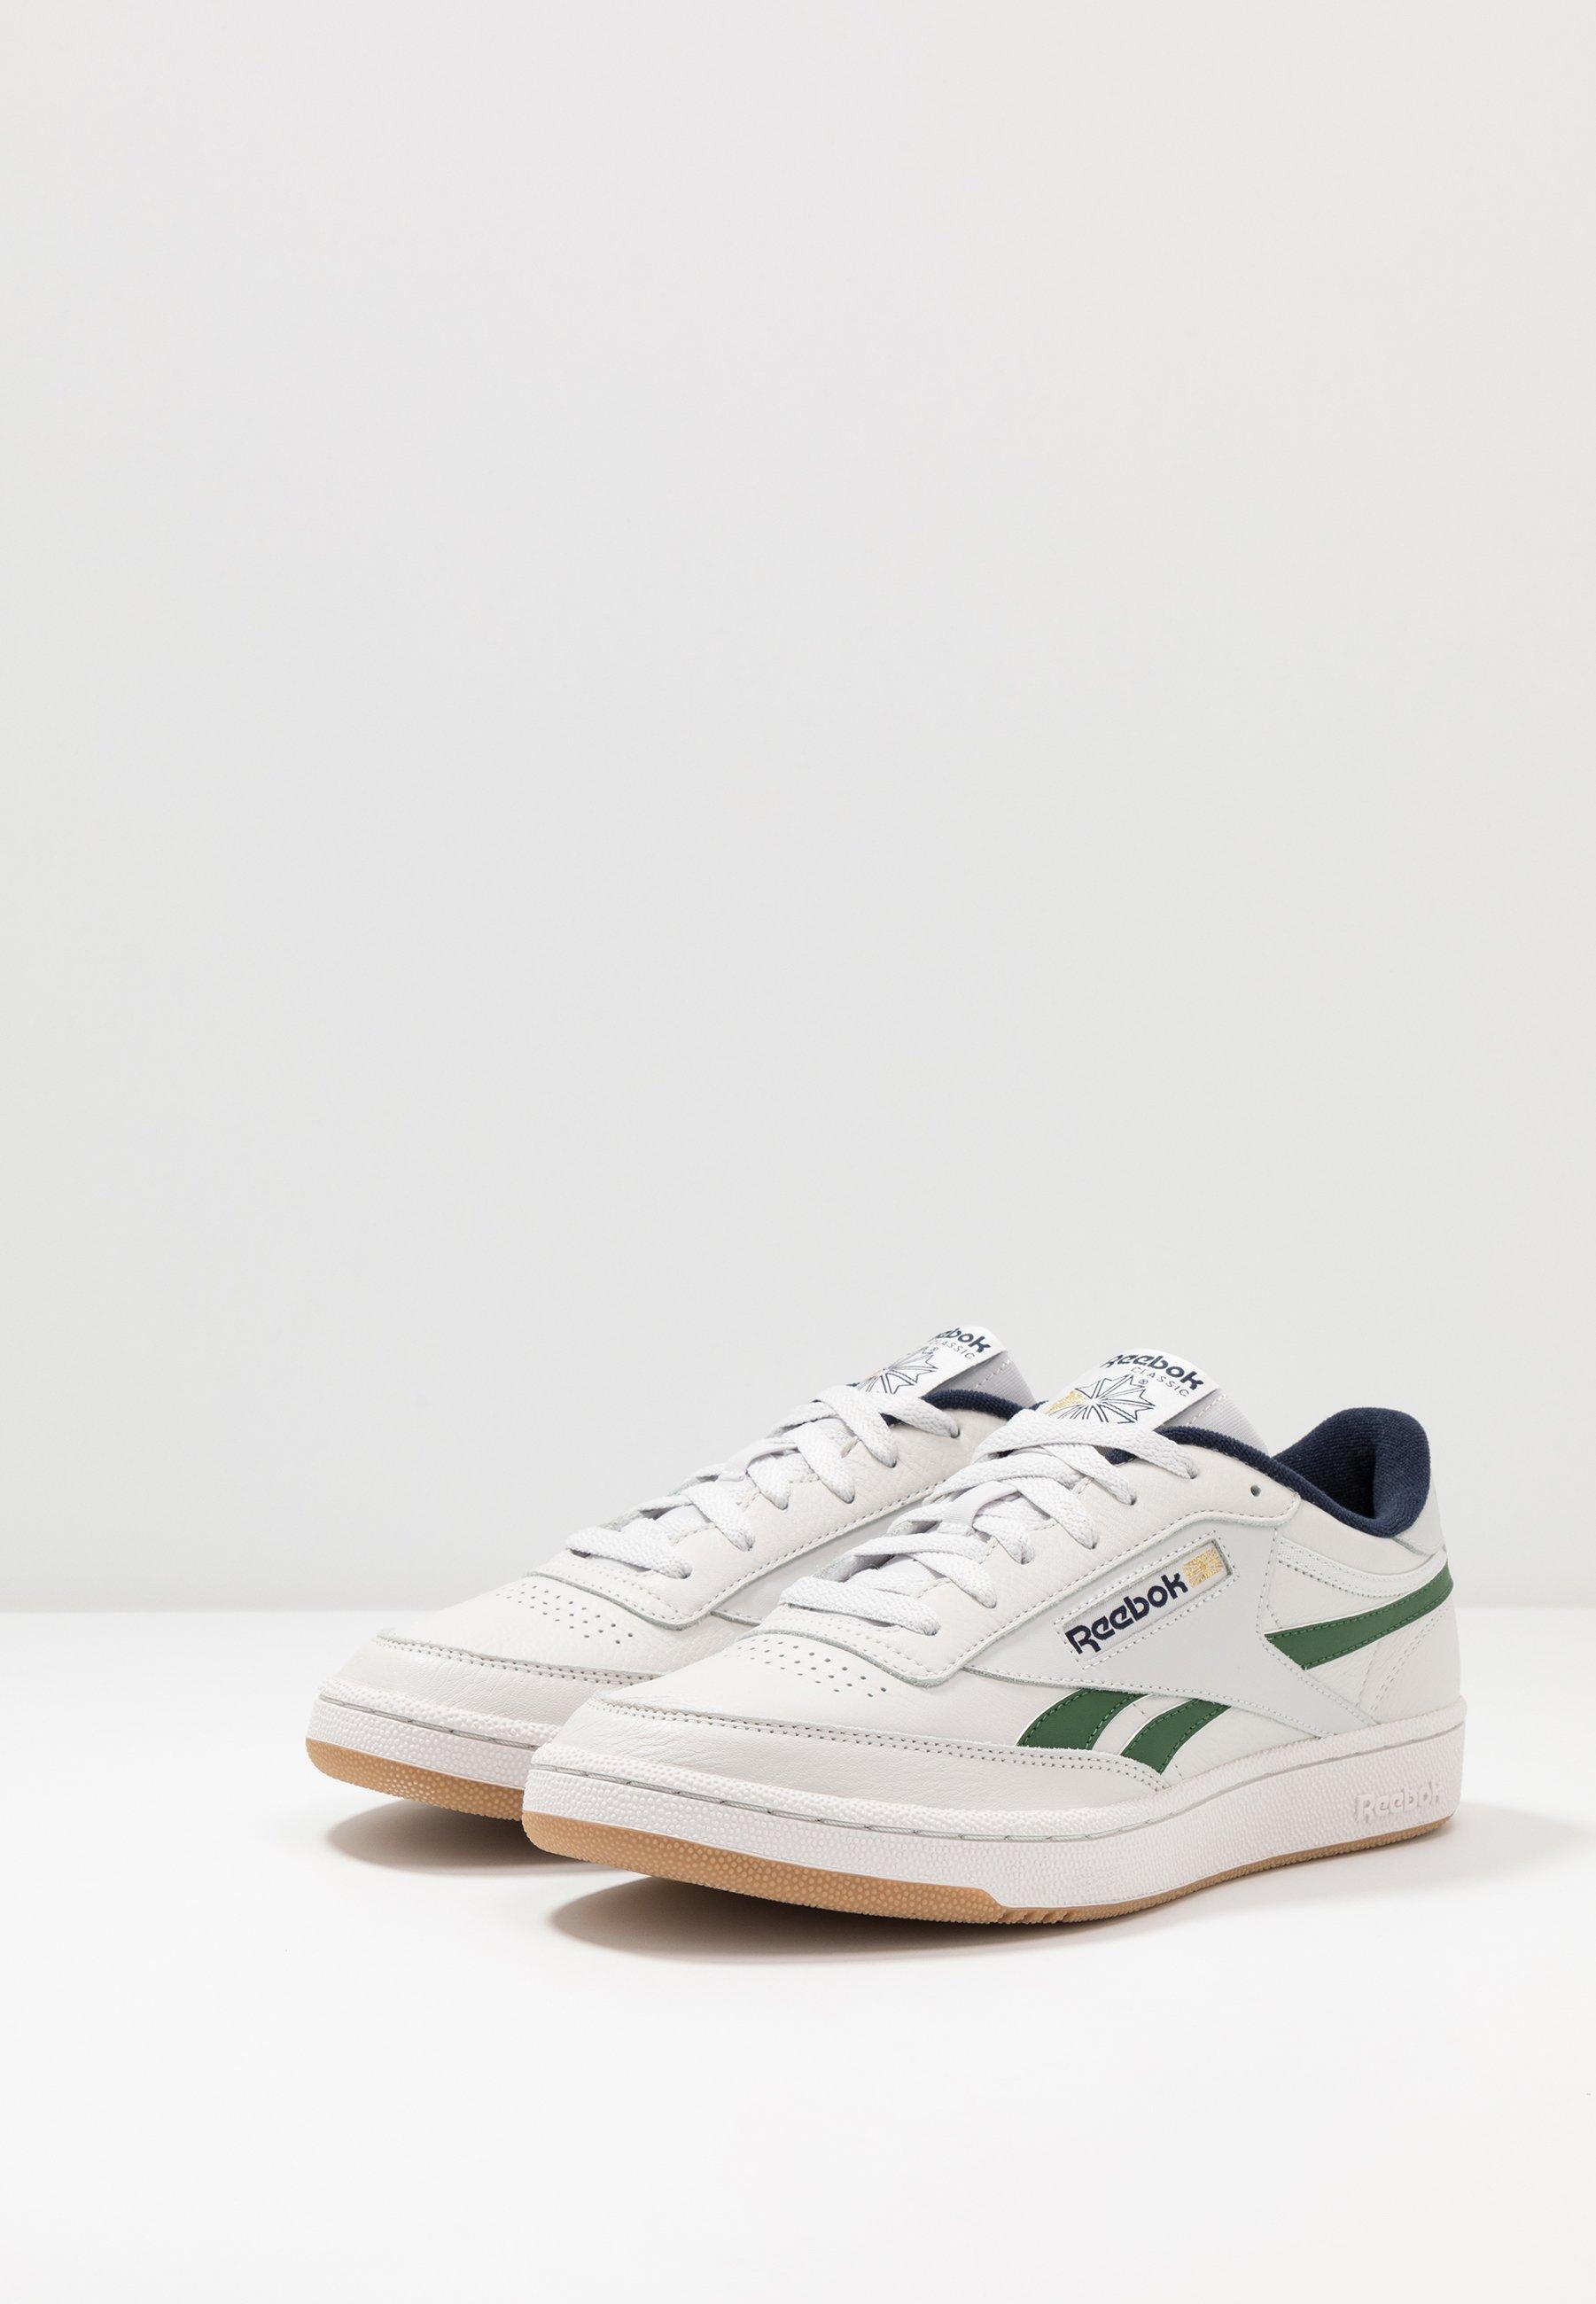 Reebok Classic CLUB REVENGE - Sneaker low - porcelain/utility green/vector navy/weiß - Herrenschuhe 25RUX